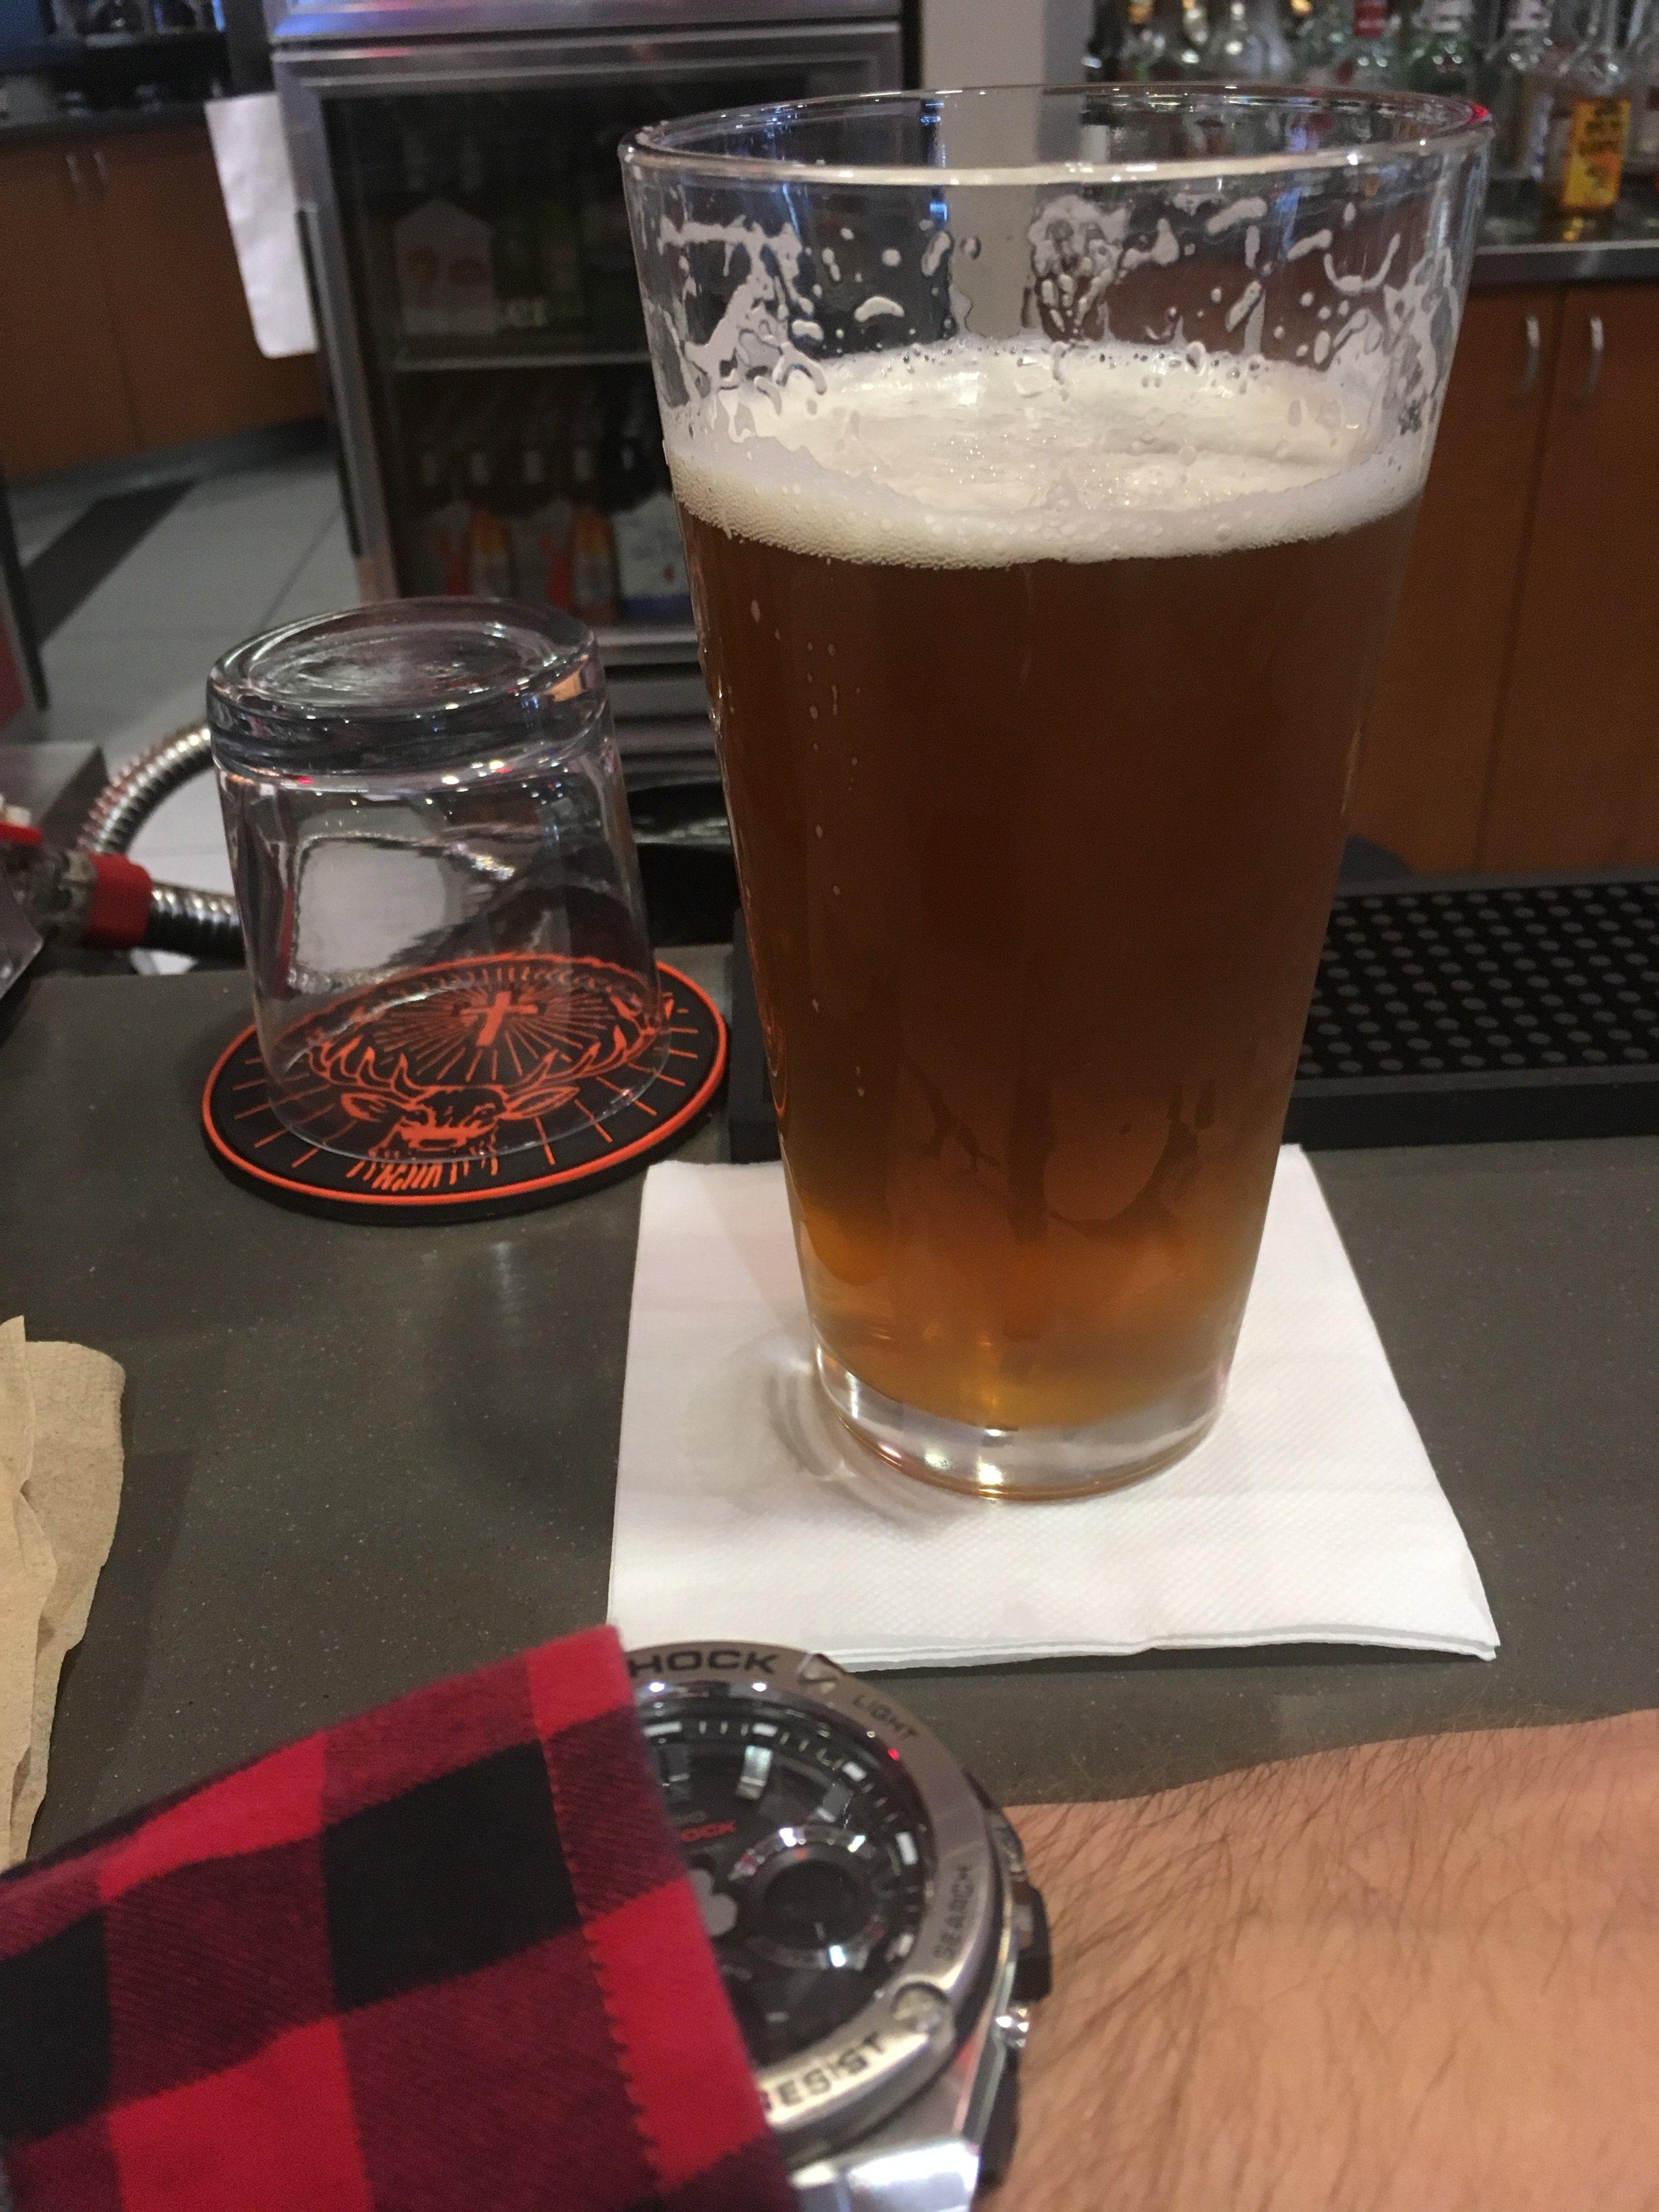 Chattanooga Beer Airport.JPG